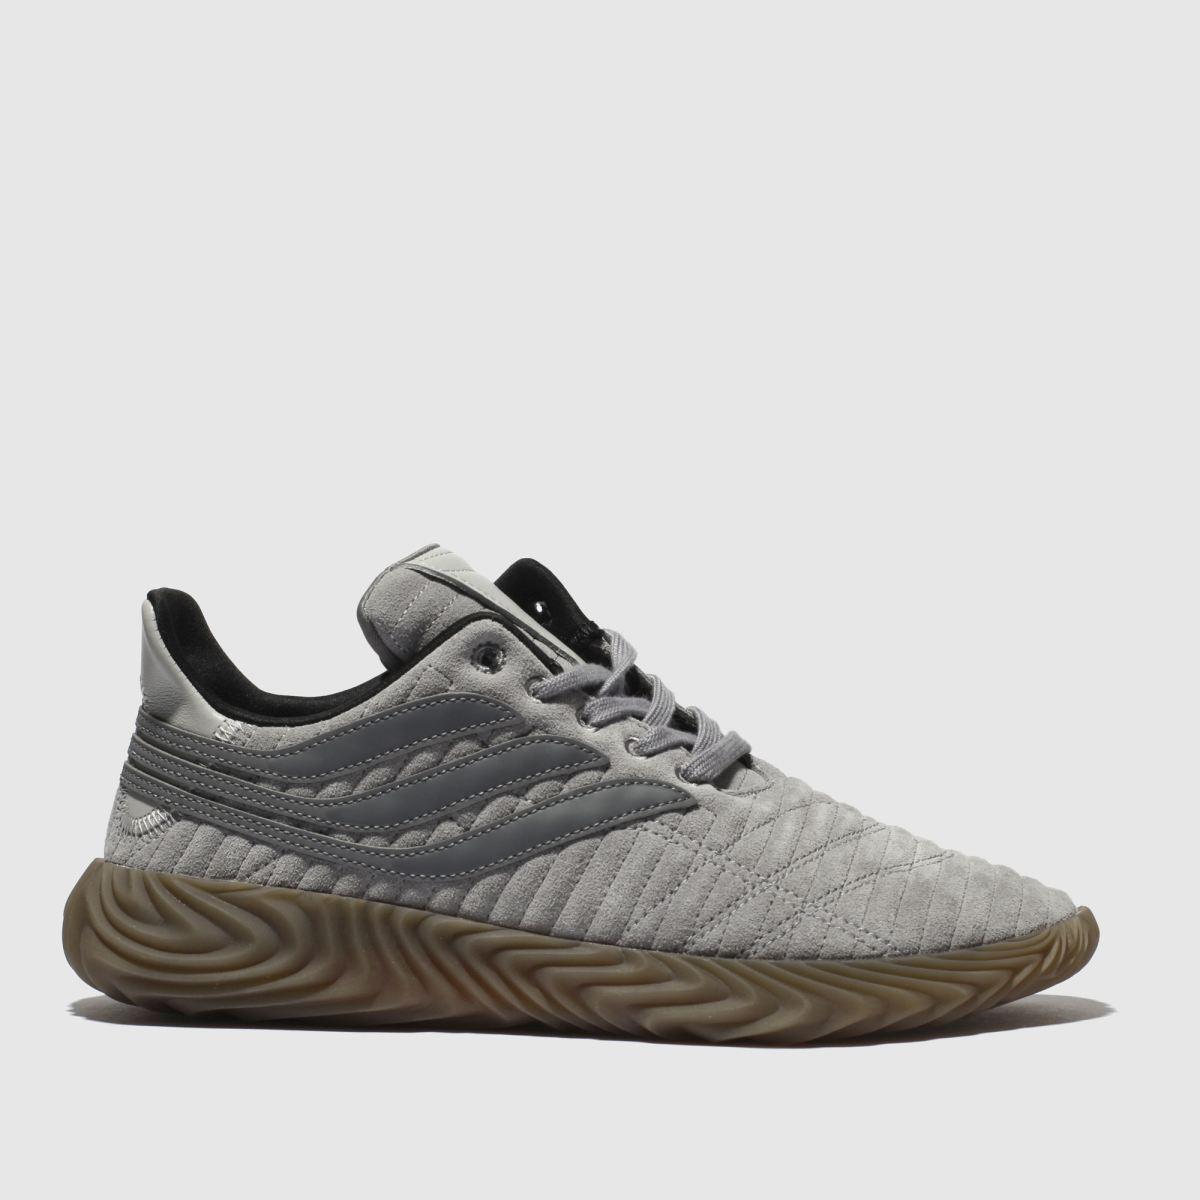 Adidas Light Grey Sobakov Trainers